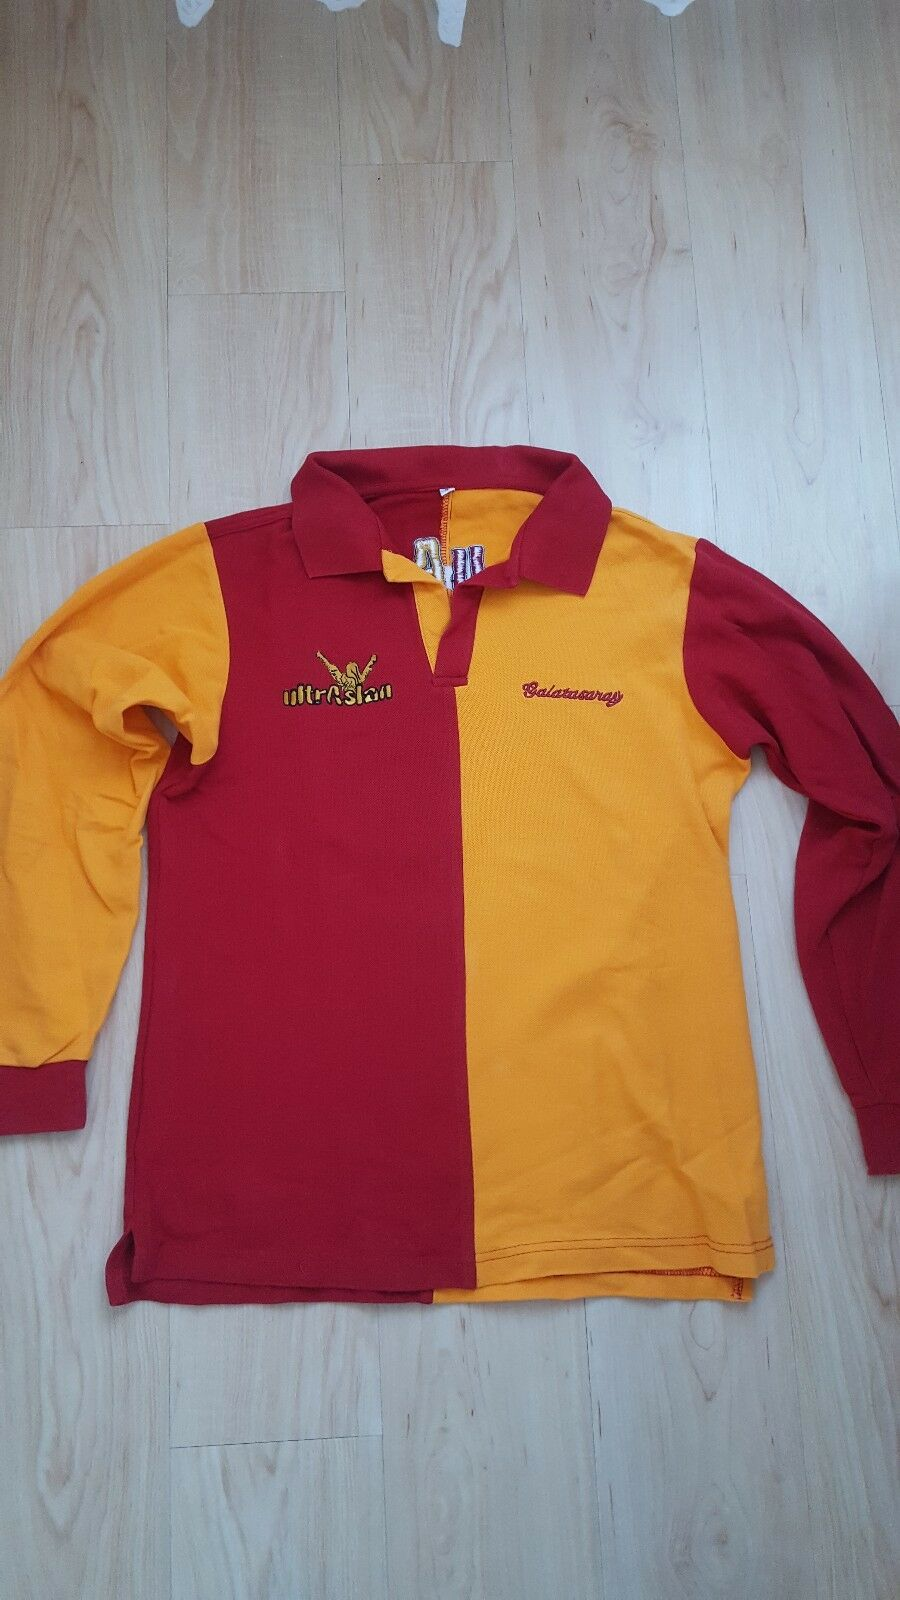 Ultraslan Original Galatasaray Sweatshirt Original Ultraslan  Gr. S de849c